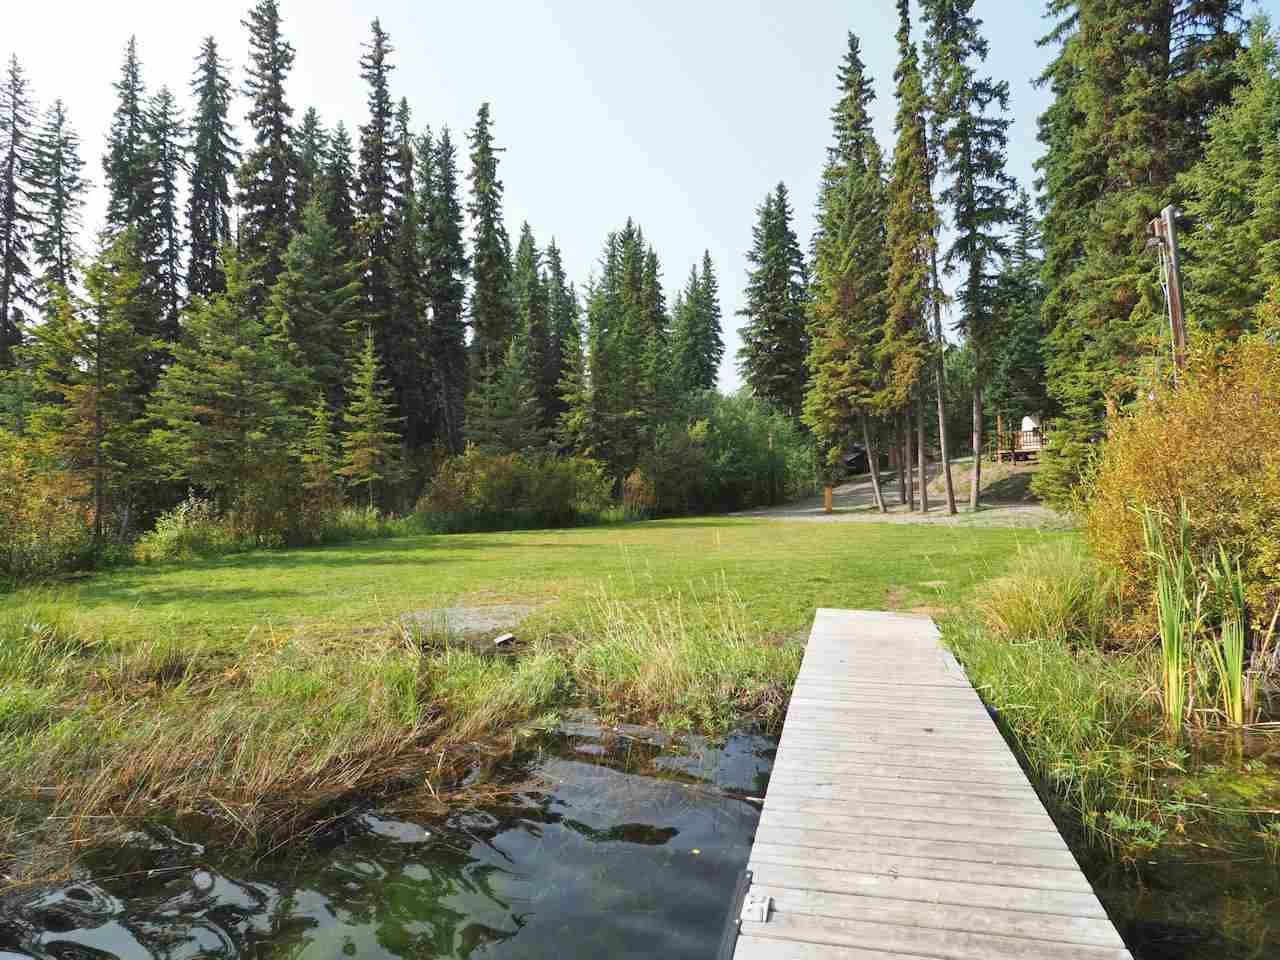 Photo 3: Photos: 7271 NATH Road in Bridge Lake: Bridge Lake/Sheridan Lake Land for sale (100 Mile House (Zone 10))  : MLS®# R2496086